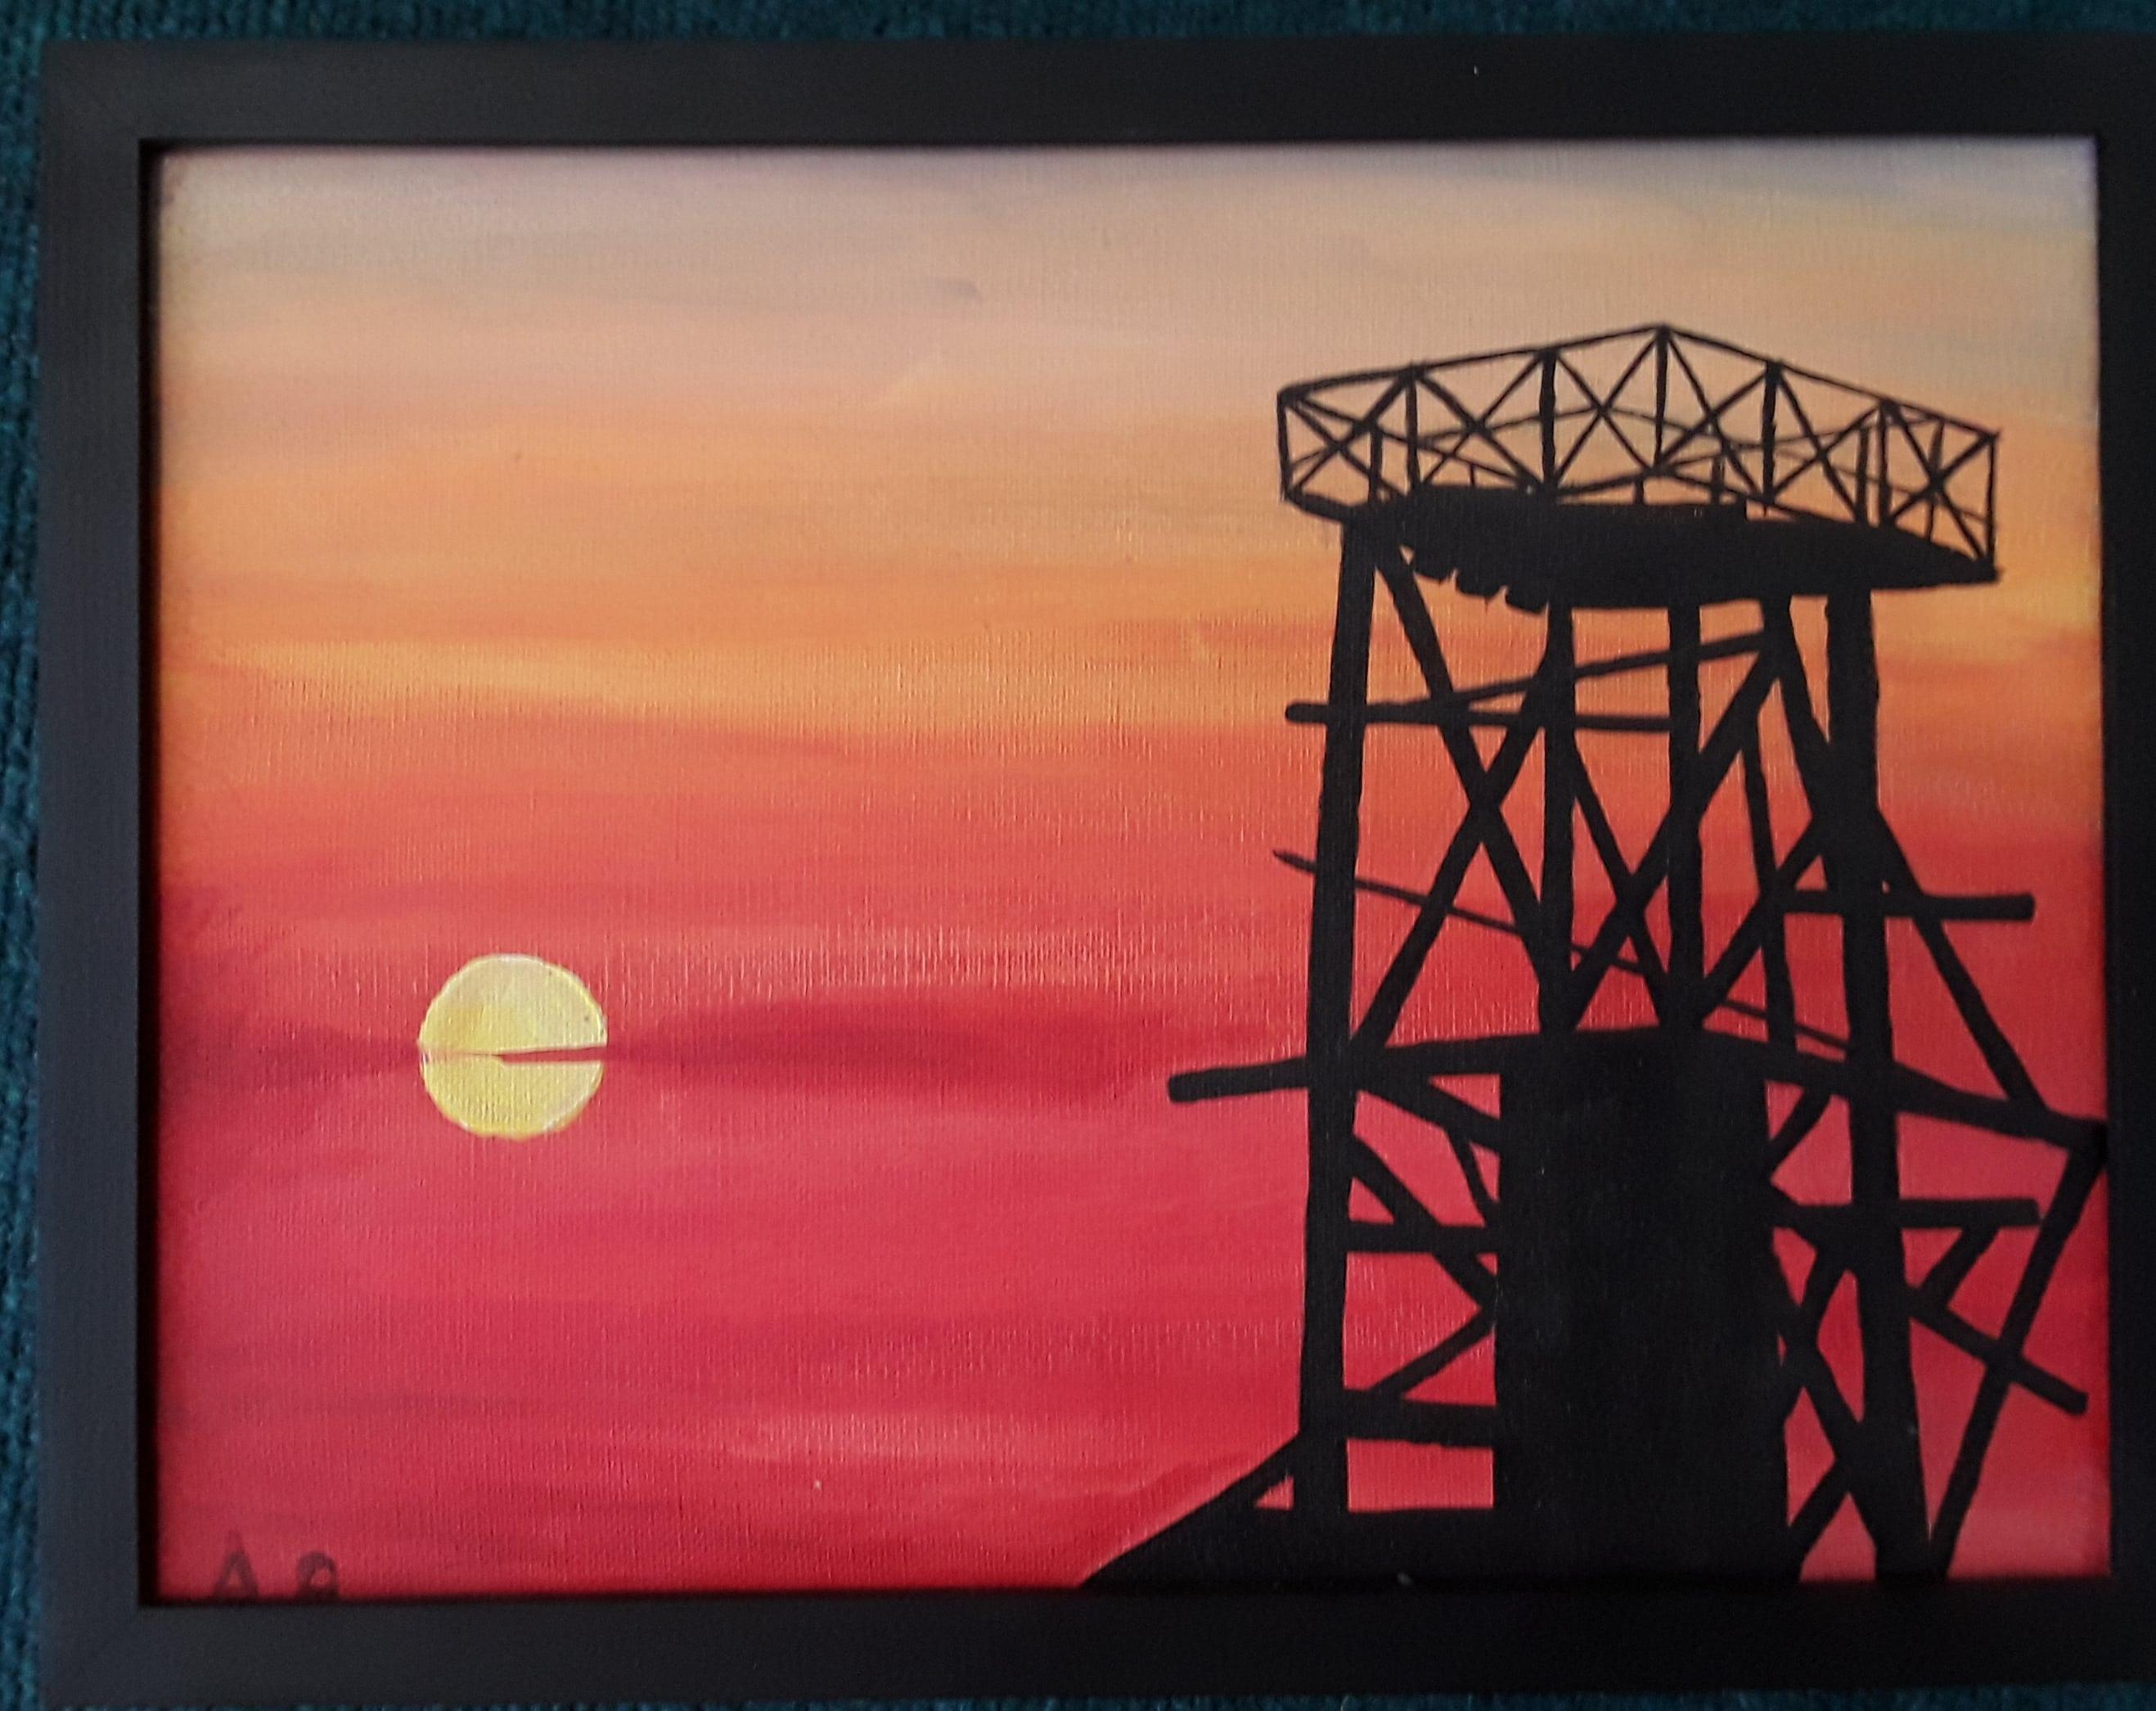 South crofty tin mine at sunset